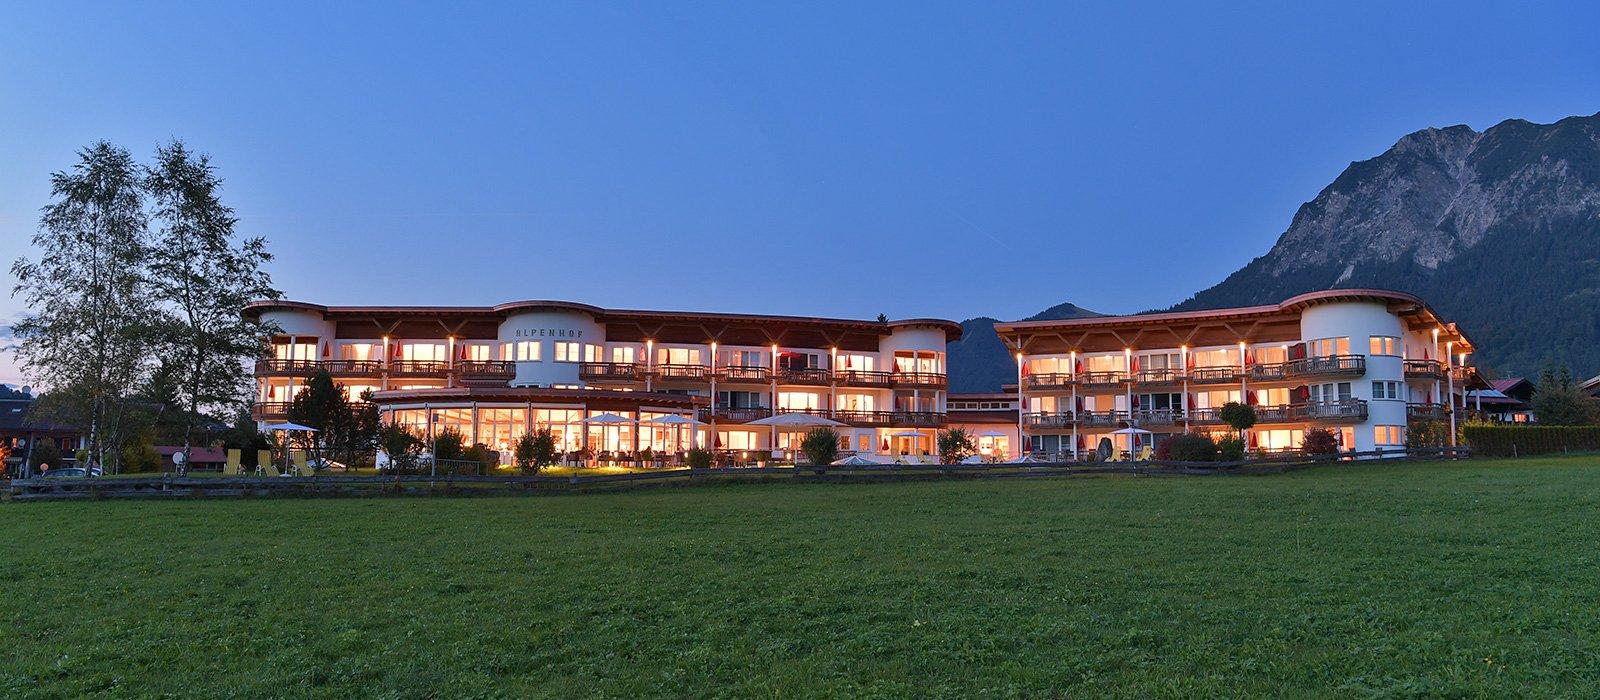 Hotel Oberstdorf Allgau Best Western Plus Hotel Alpenhof